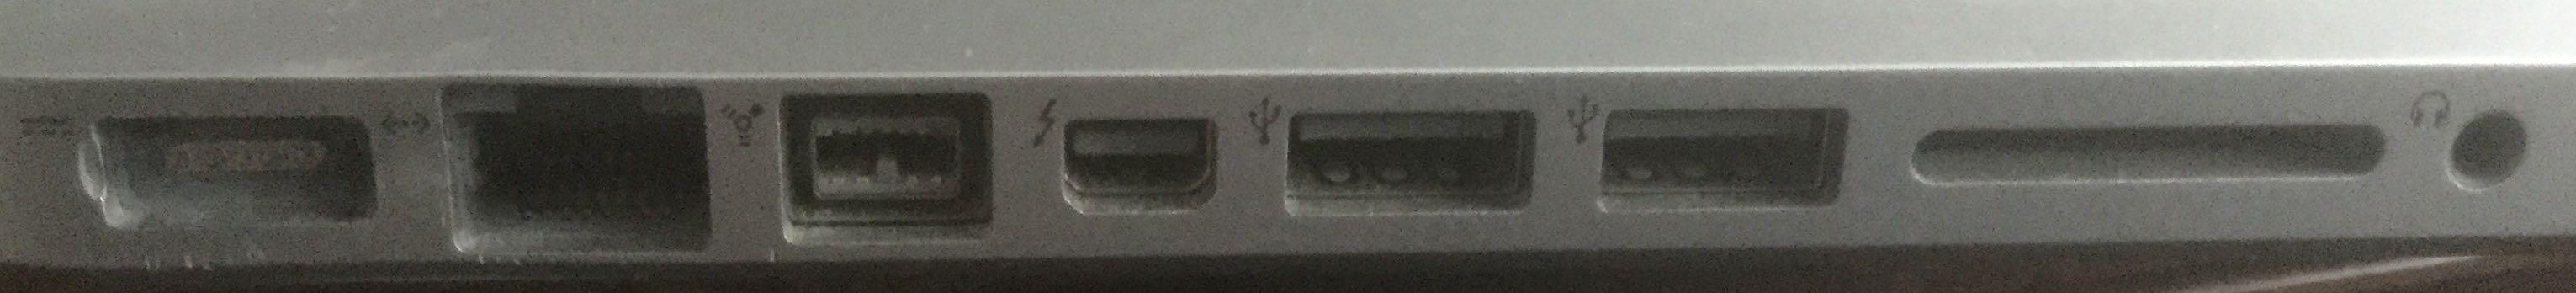 Macbook ports.jpg